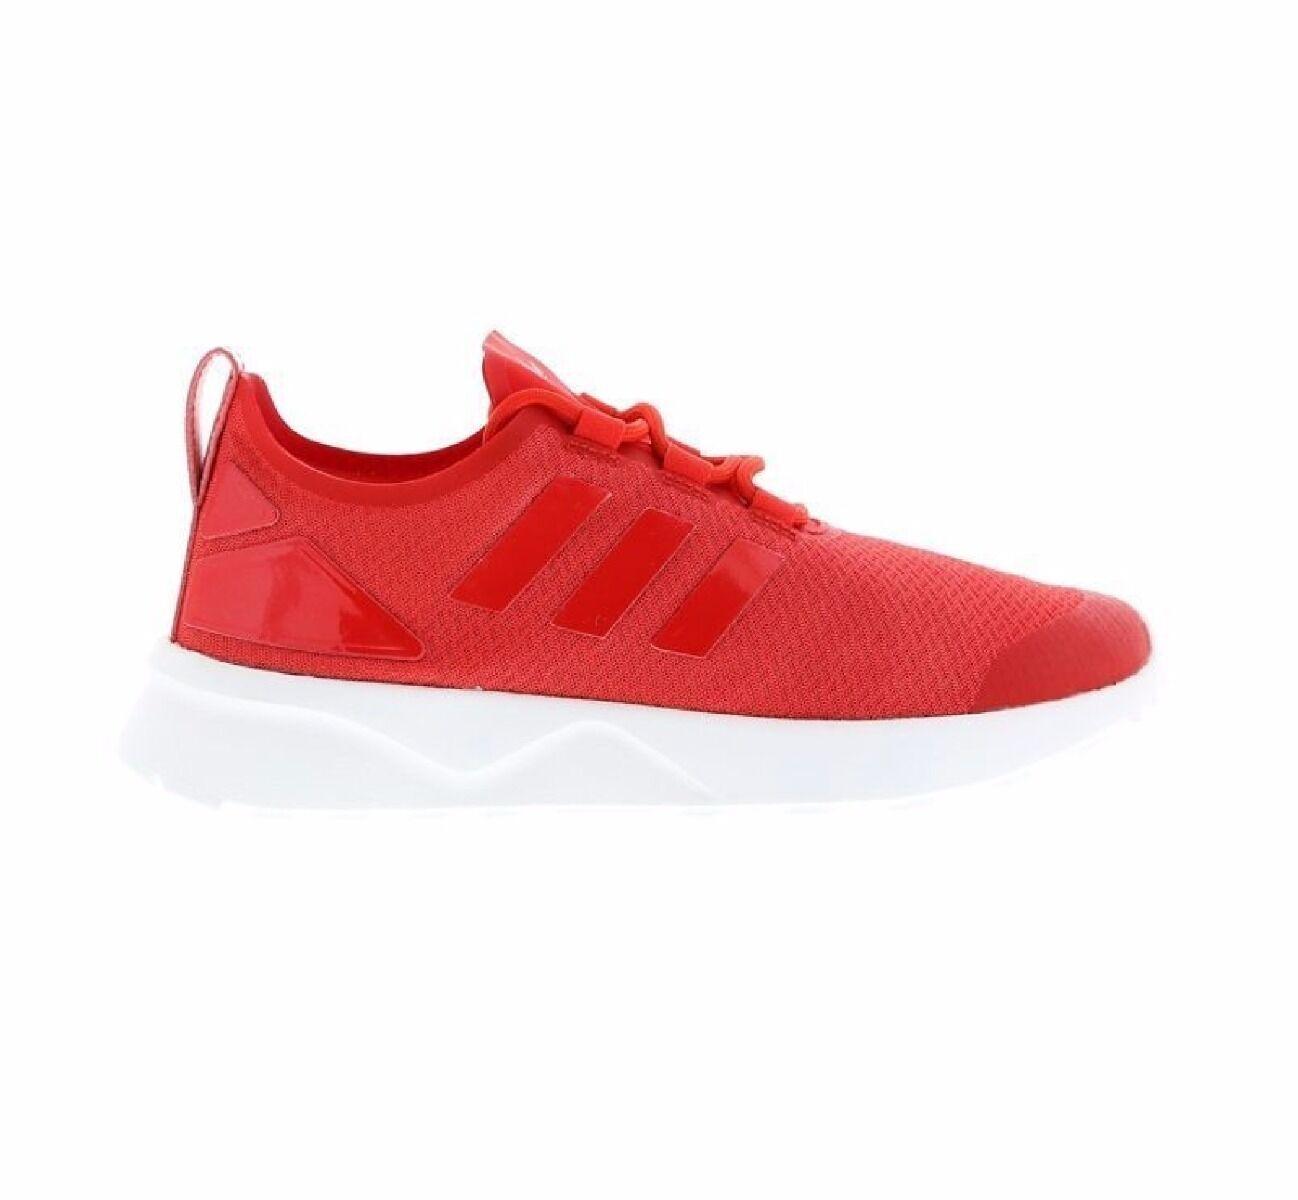 Adidas ZX FLUX ADV SIZE VERVE Damenschuhe RUNNING SHOE SIZE ADV 5 6.5 TRAINER   NEW RUN c6ab32